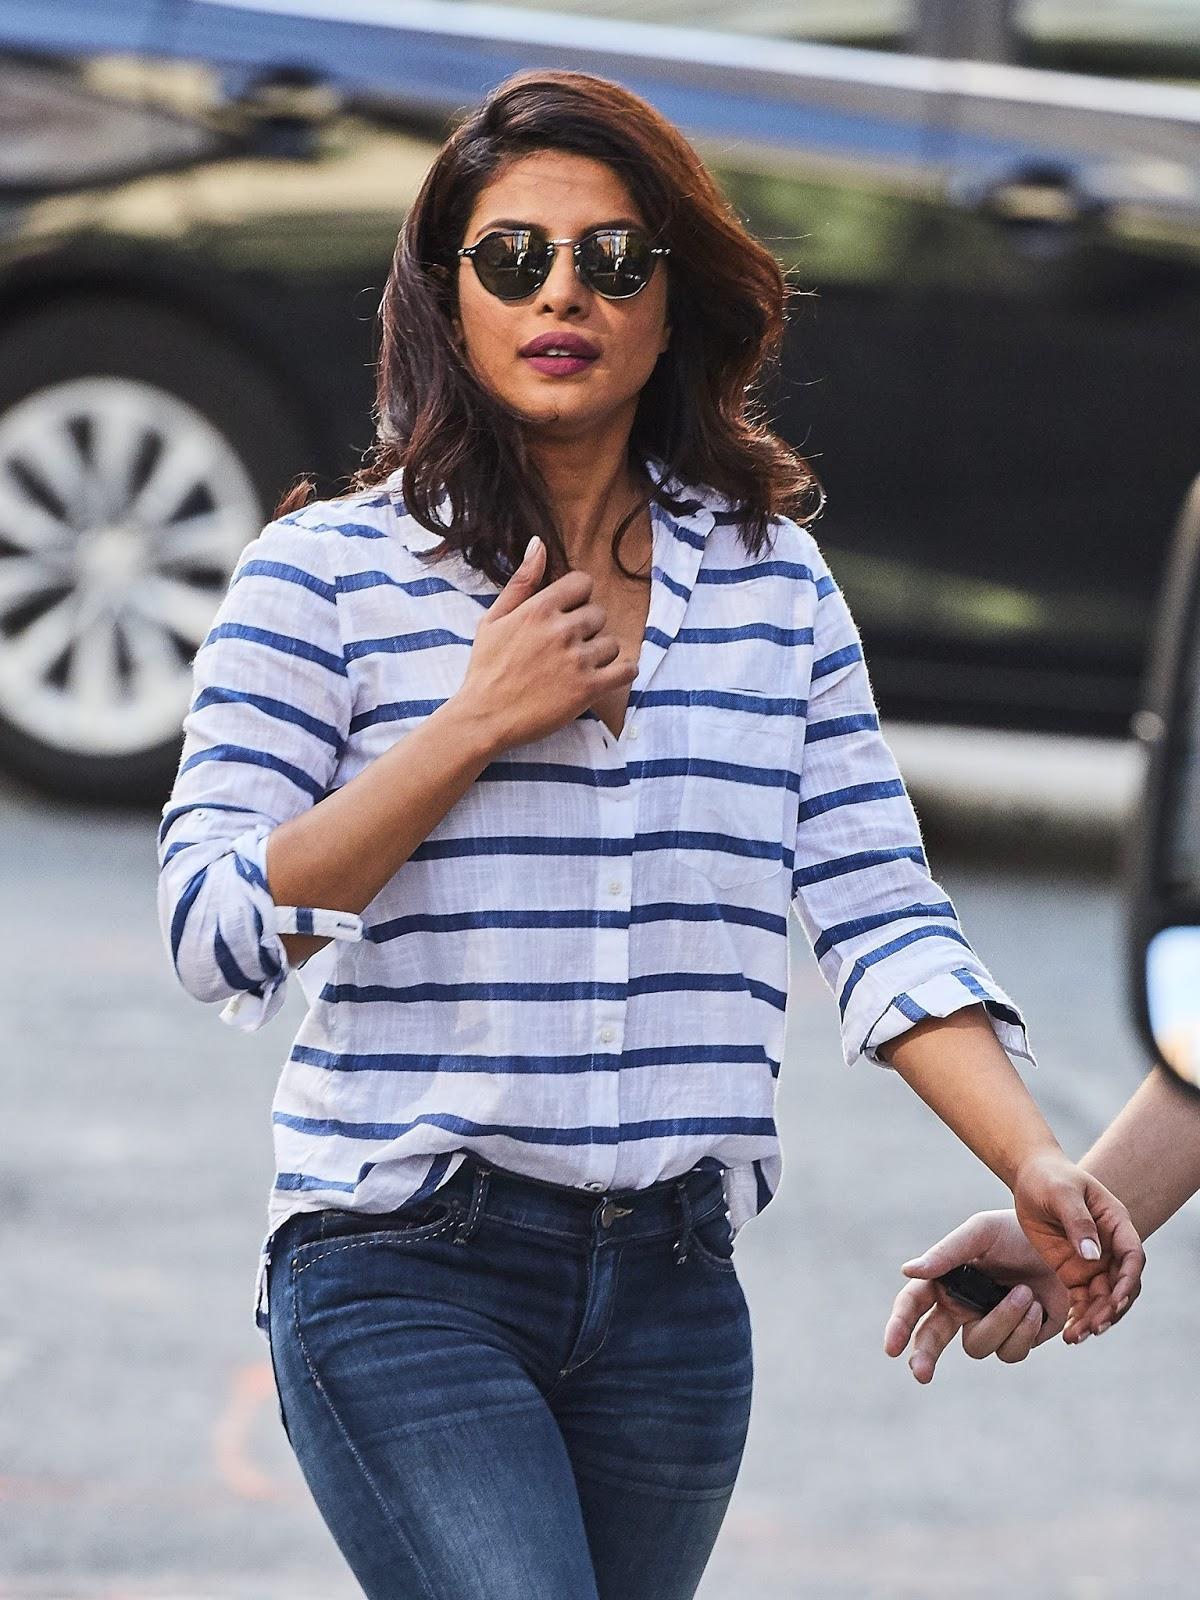 Priyanka Chopra Sexy Candids From New York - Hd Latest -8938